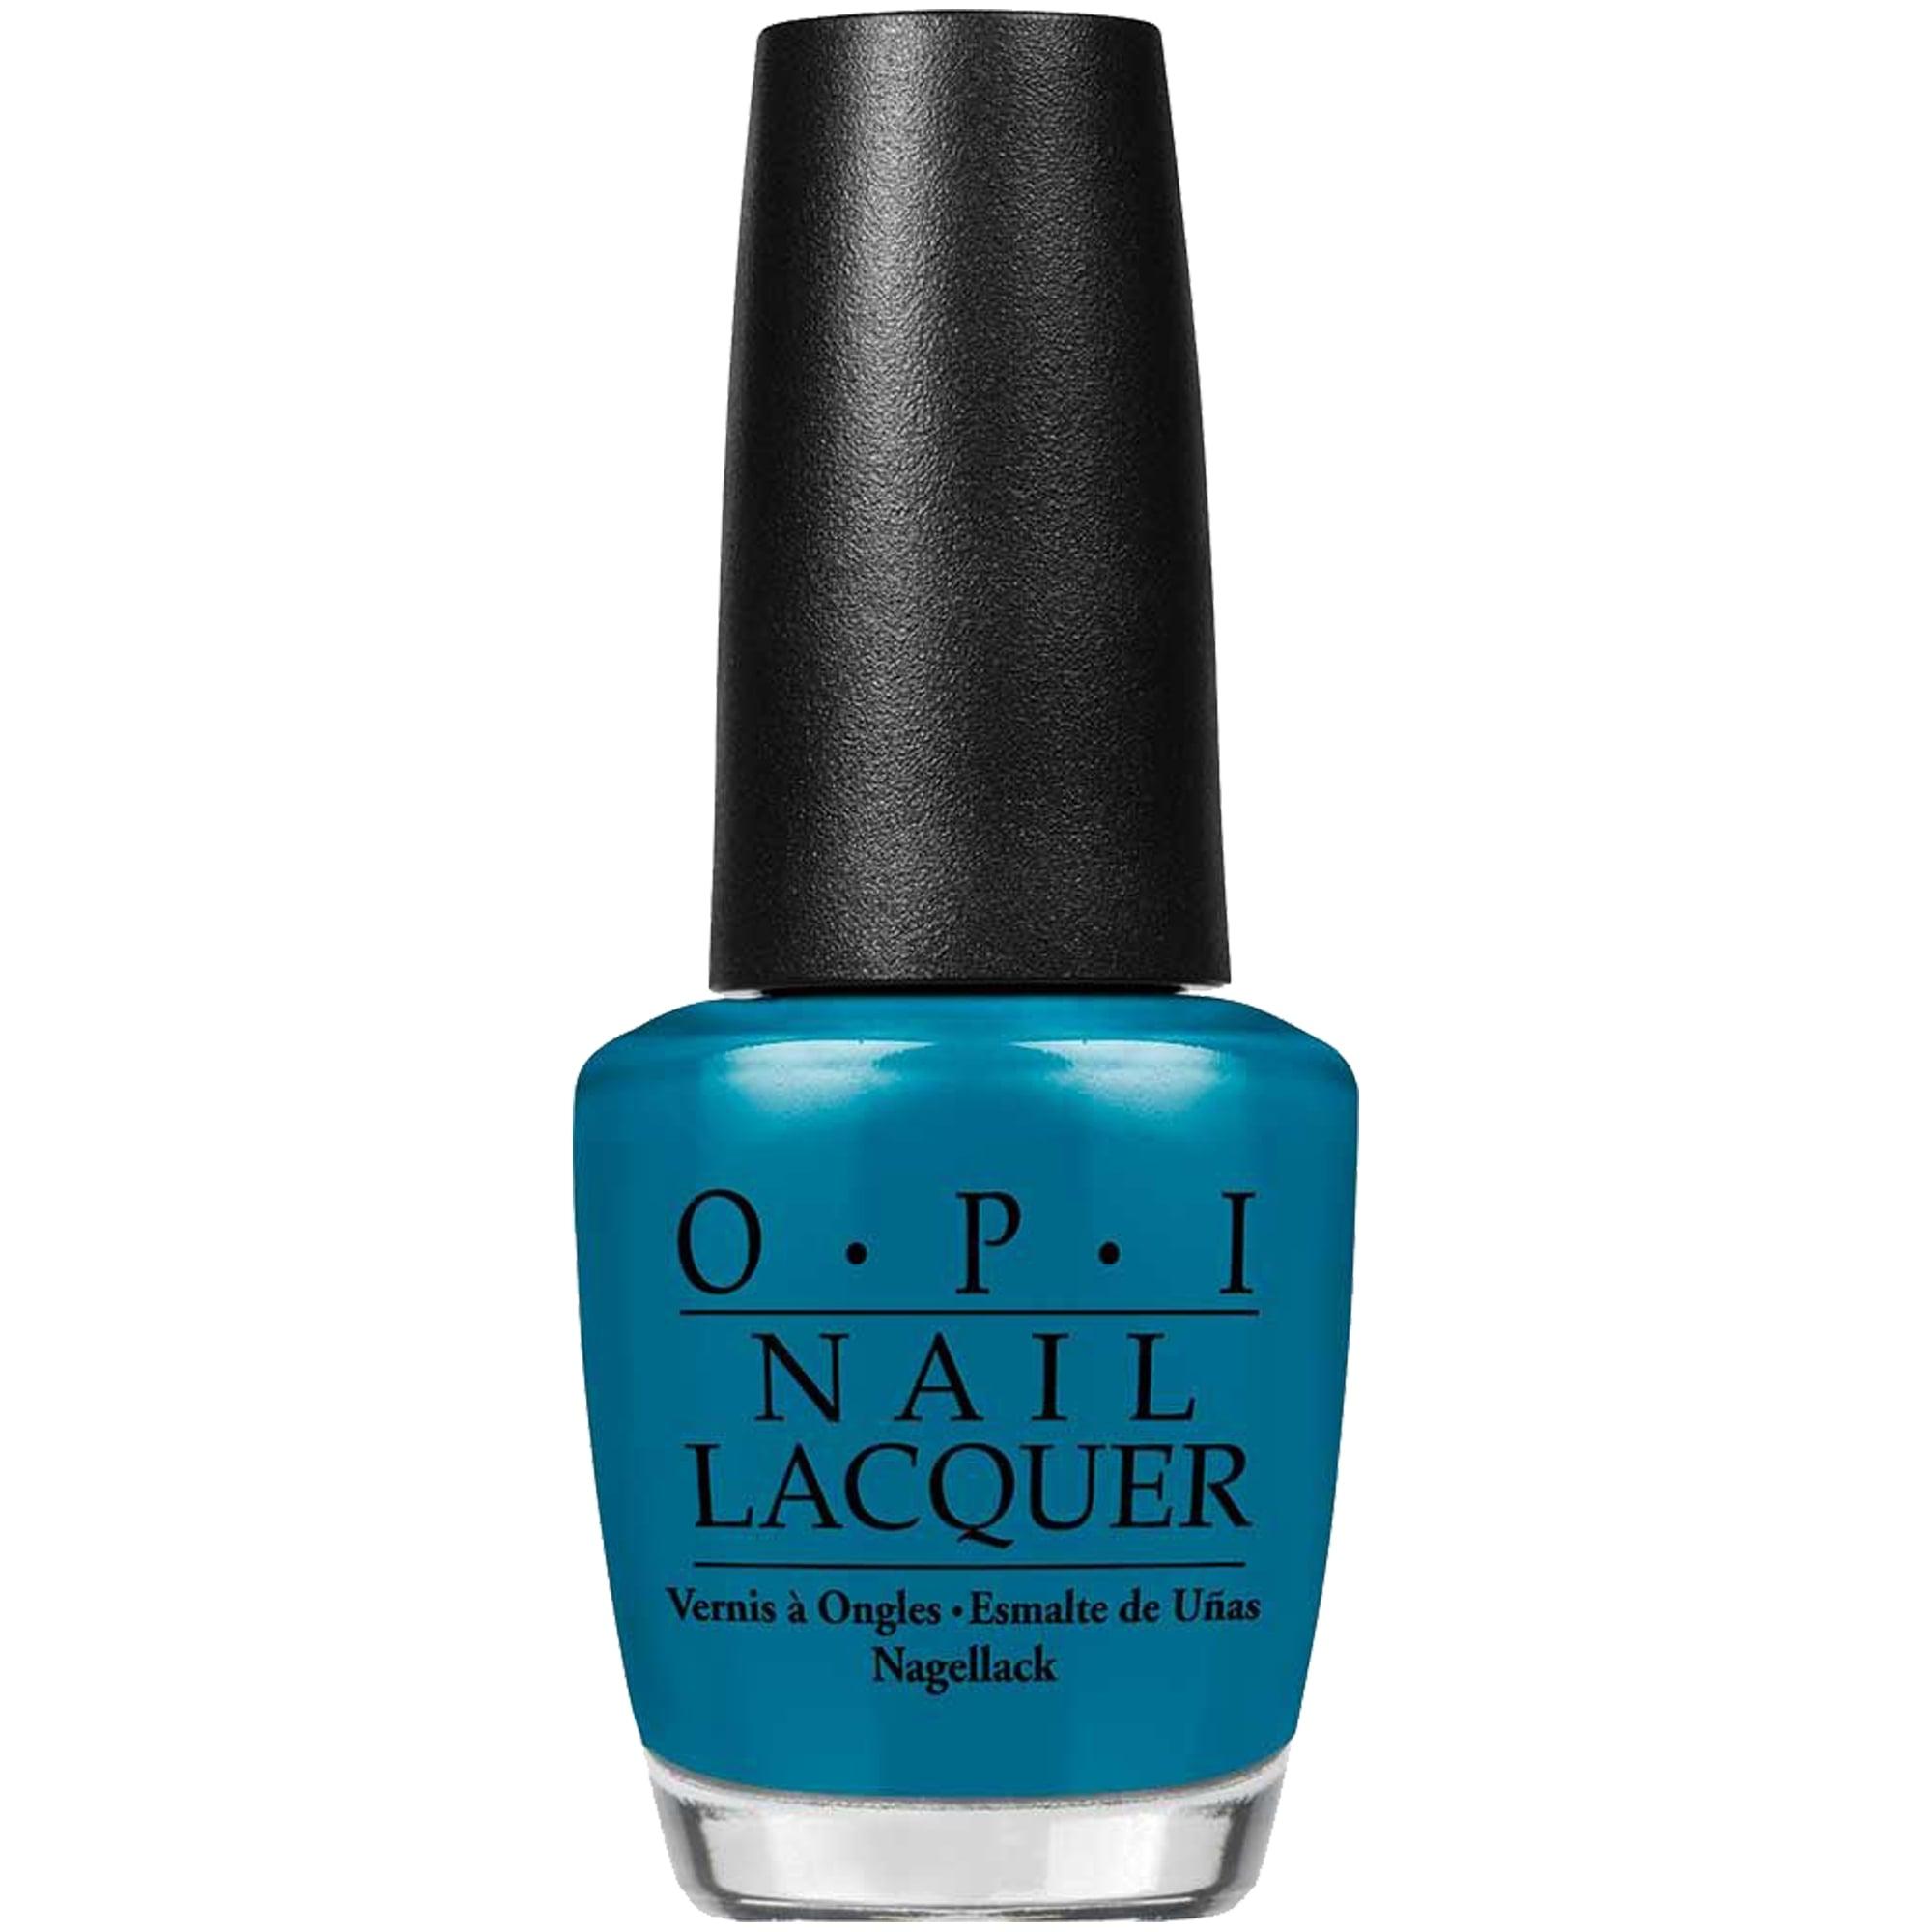 opi-nail-polish-suzi-says-feng-shui